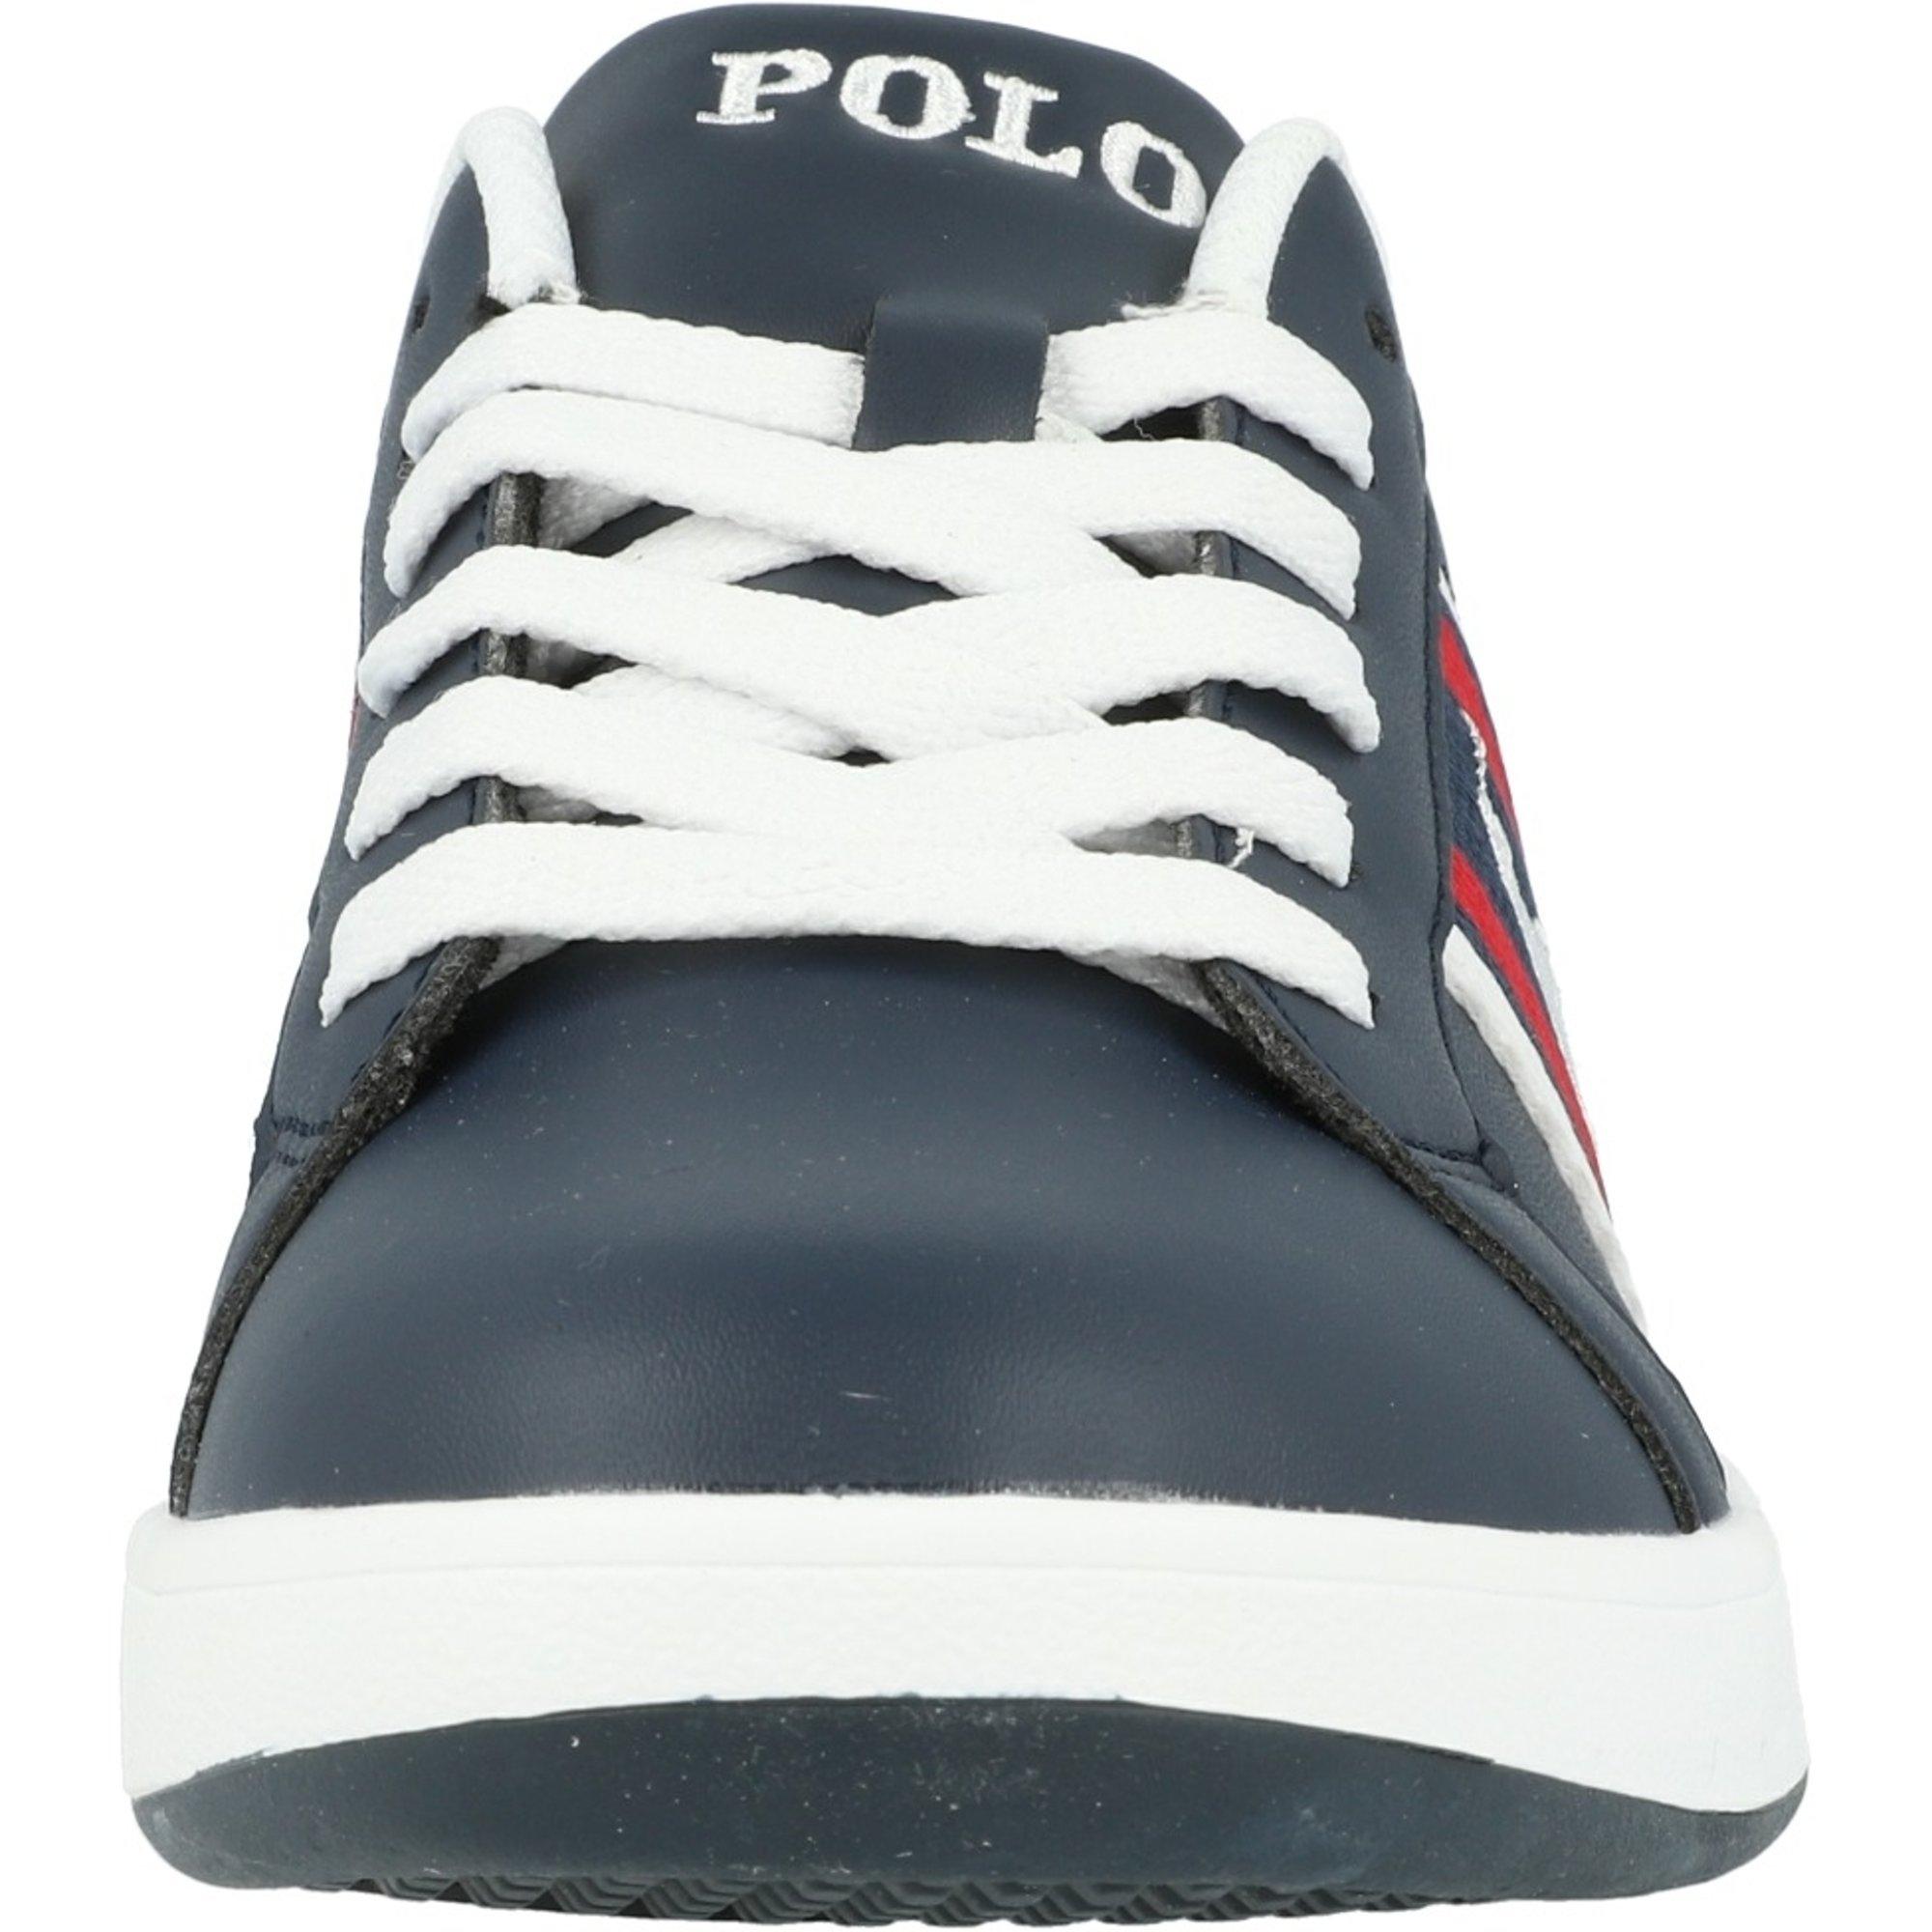 Polo Ralph Lauren Oaklynn J Navy/Red Smooth